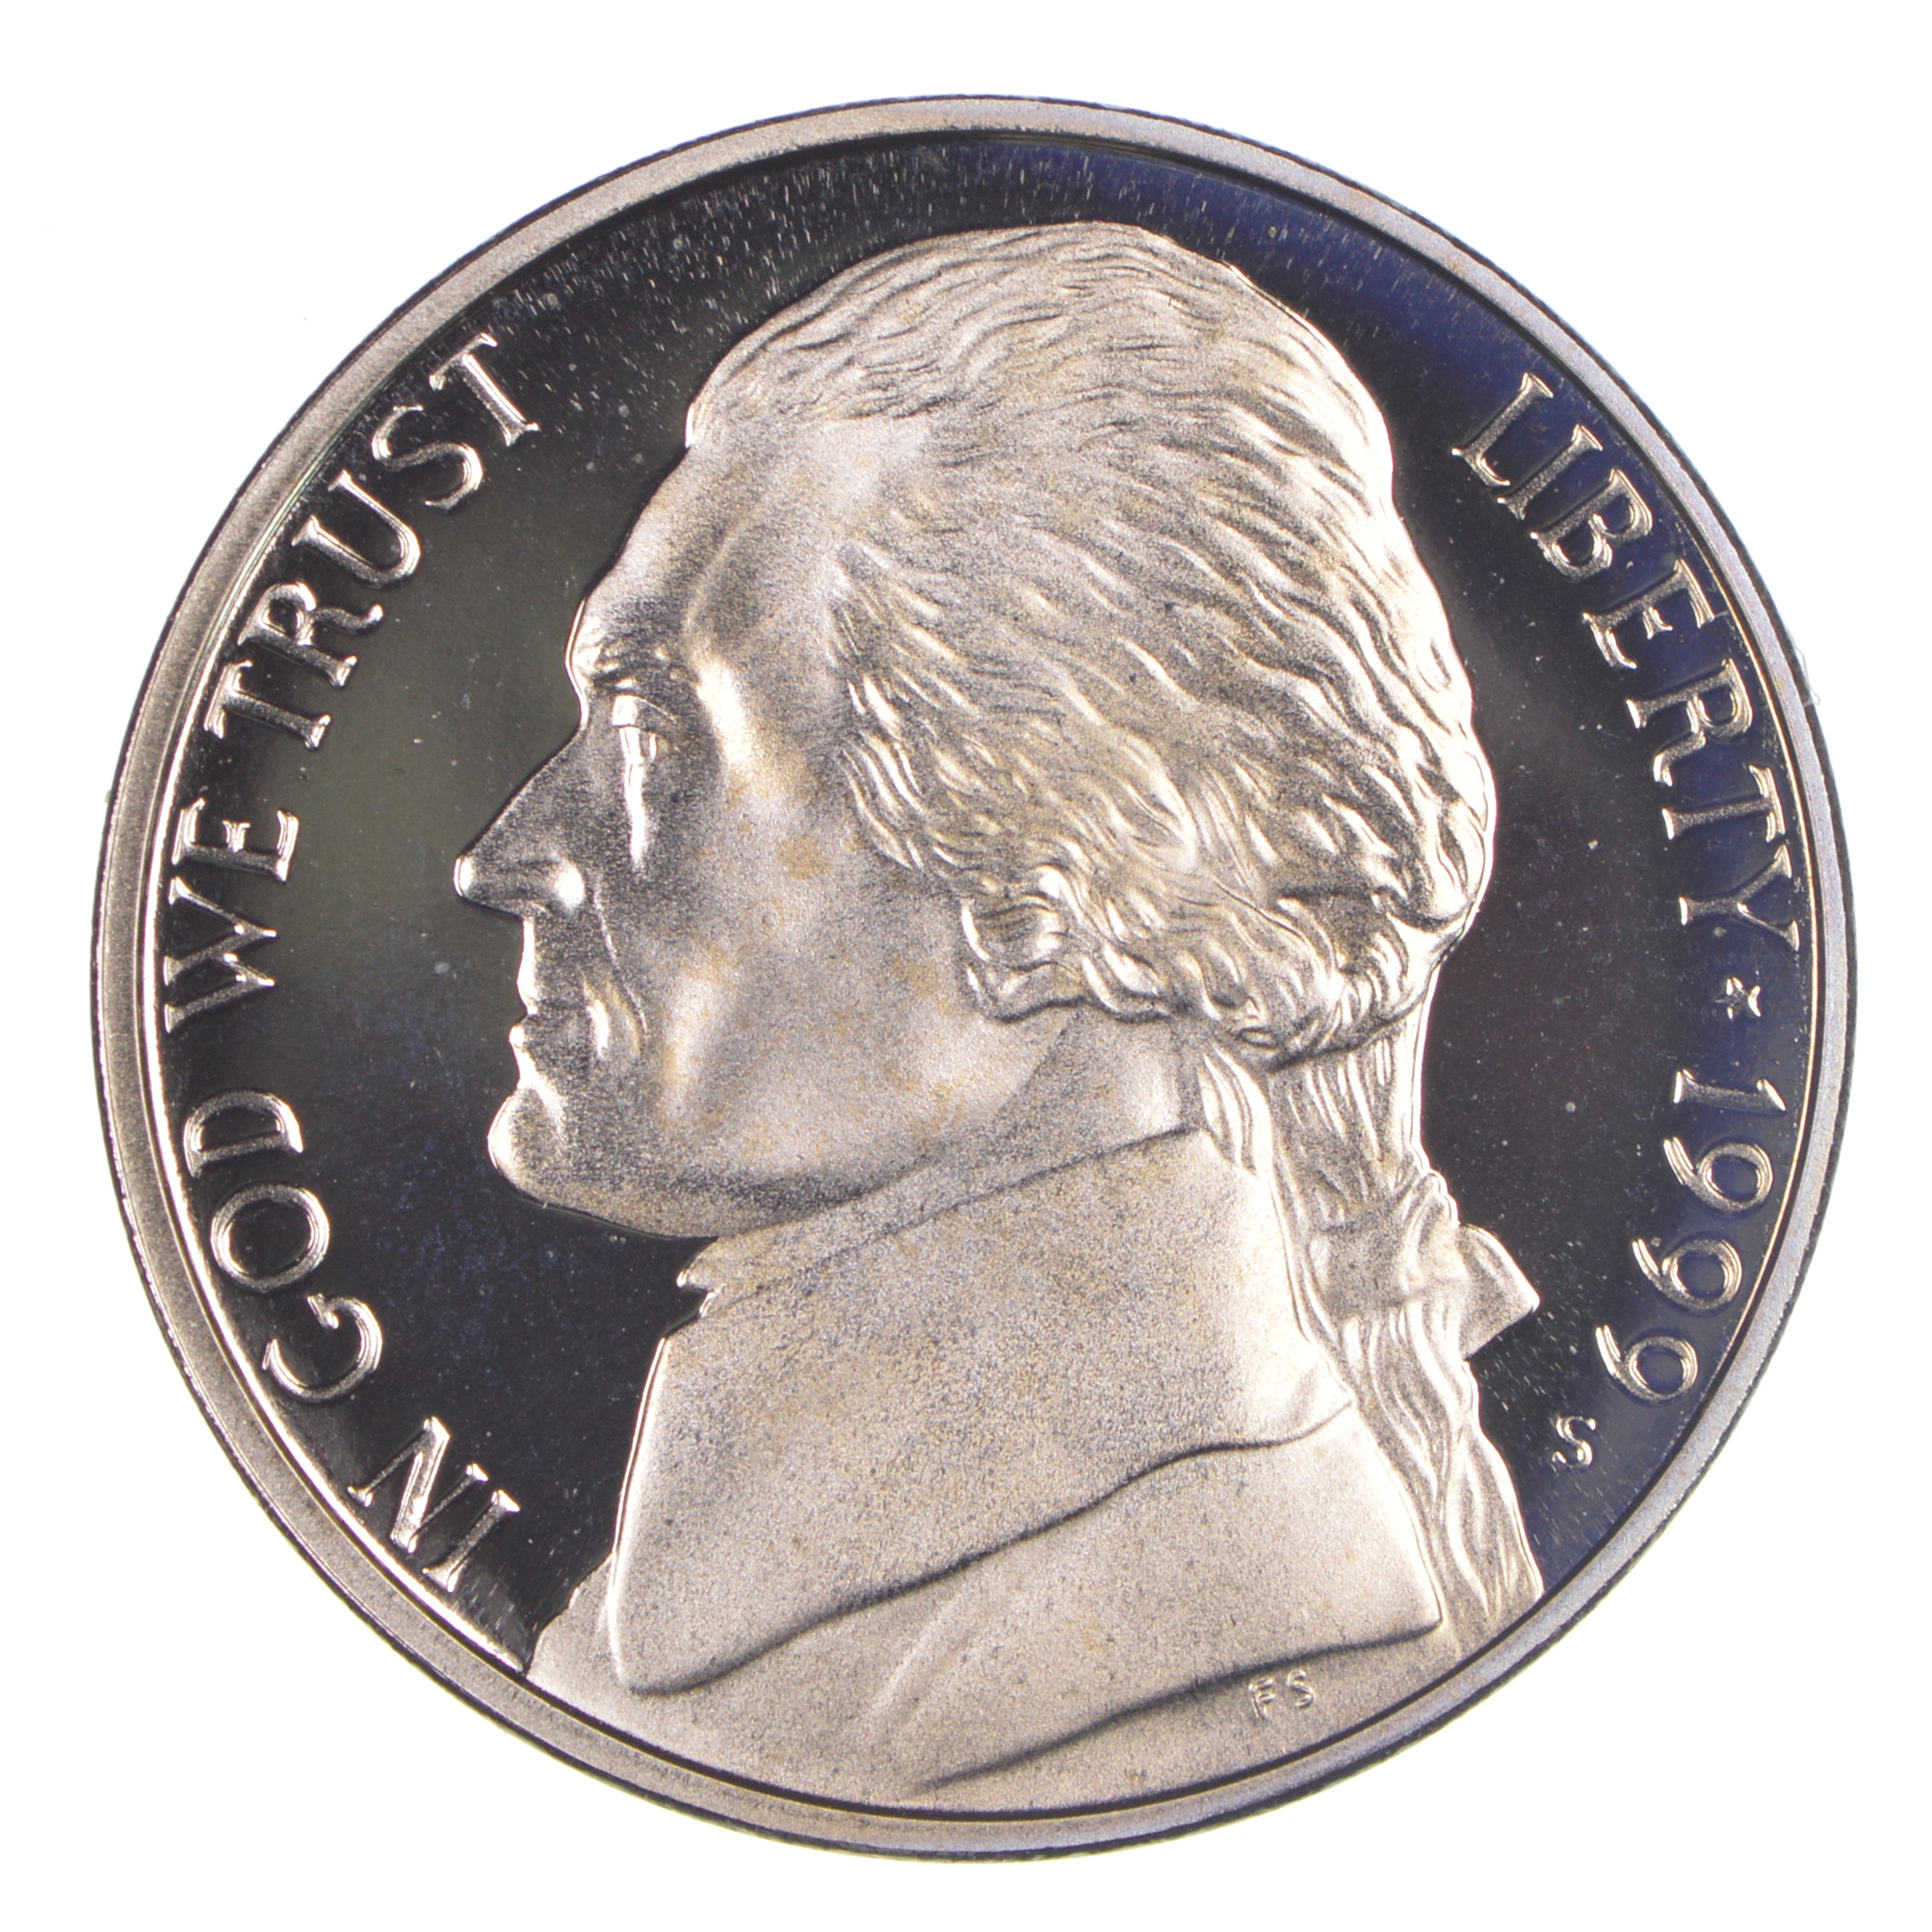 1999 S Proof Jefferson Nickel